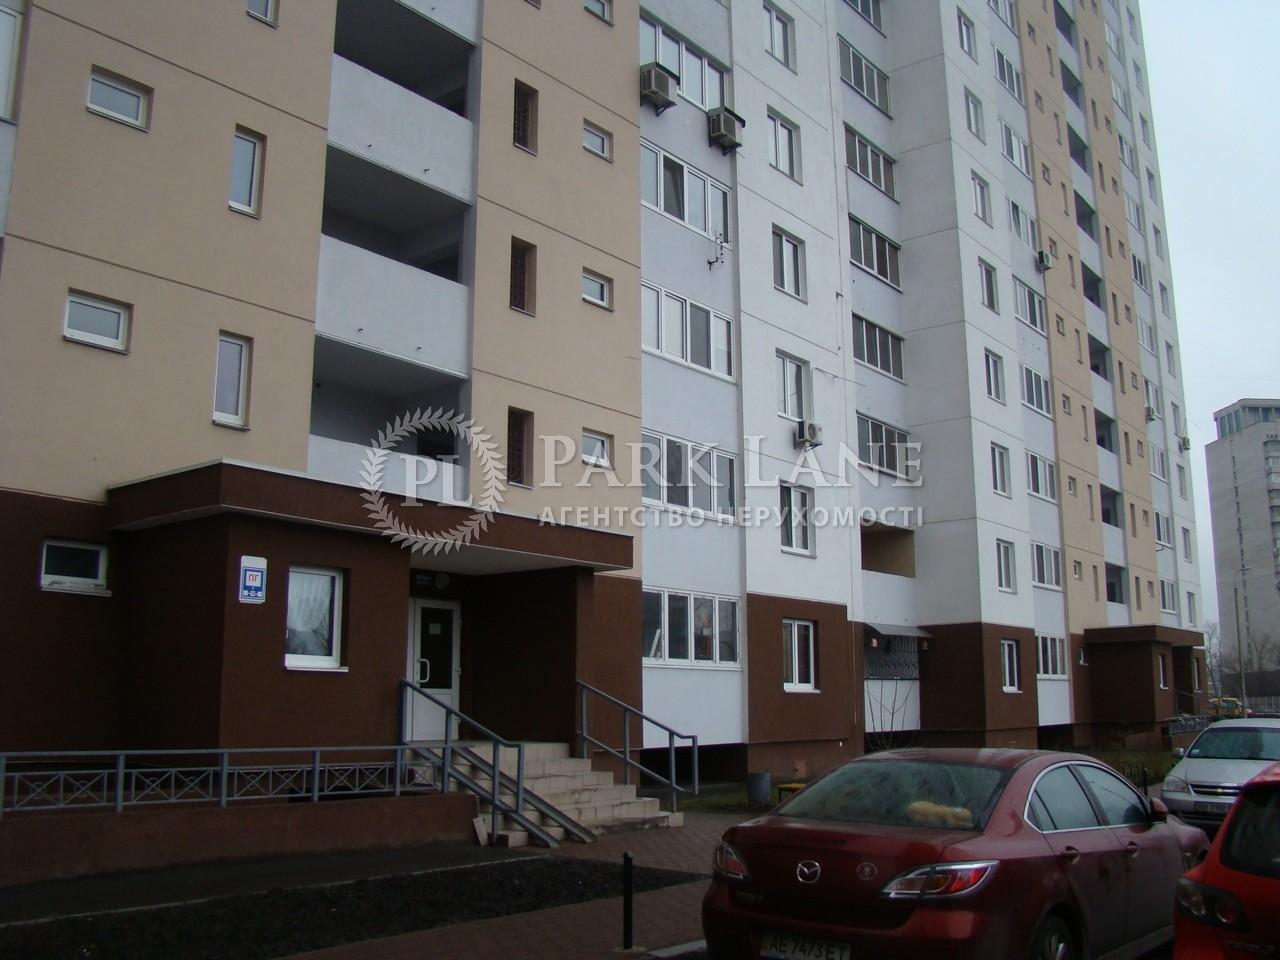 Квартира ул. Урловская, 38, Киев, L-28538 - Фото 3